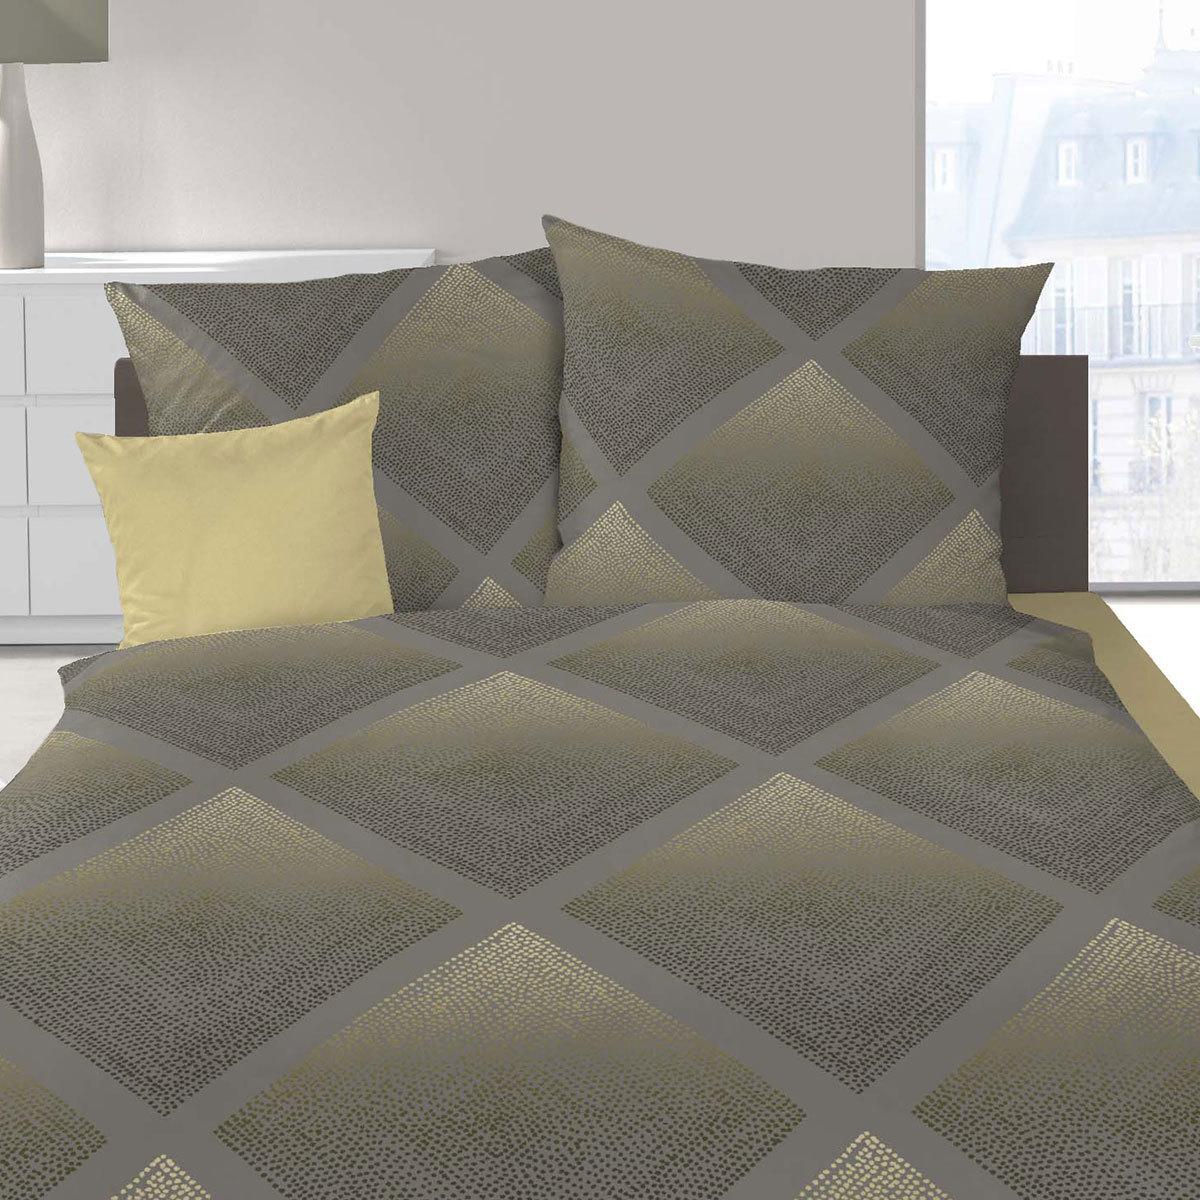 schlafgut mako satin bettw sche romba moos g nstig online kaufen bei bettwaren shop. Black Bedroom Furniture Sets. Home Design Ideas